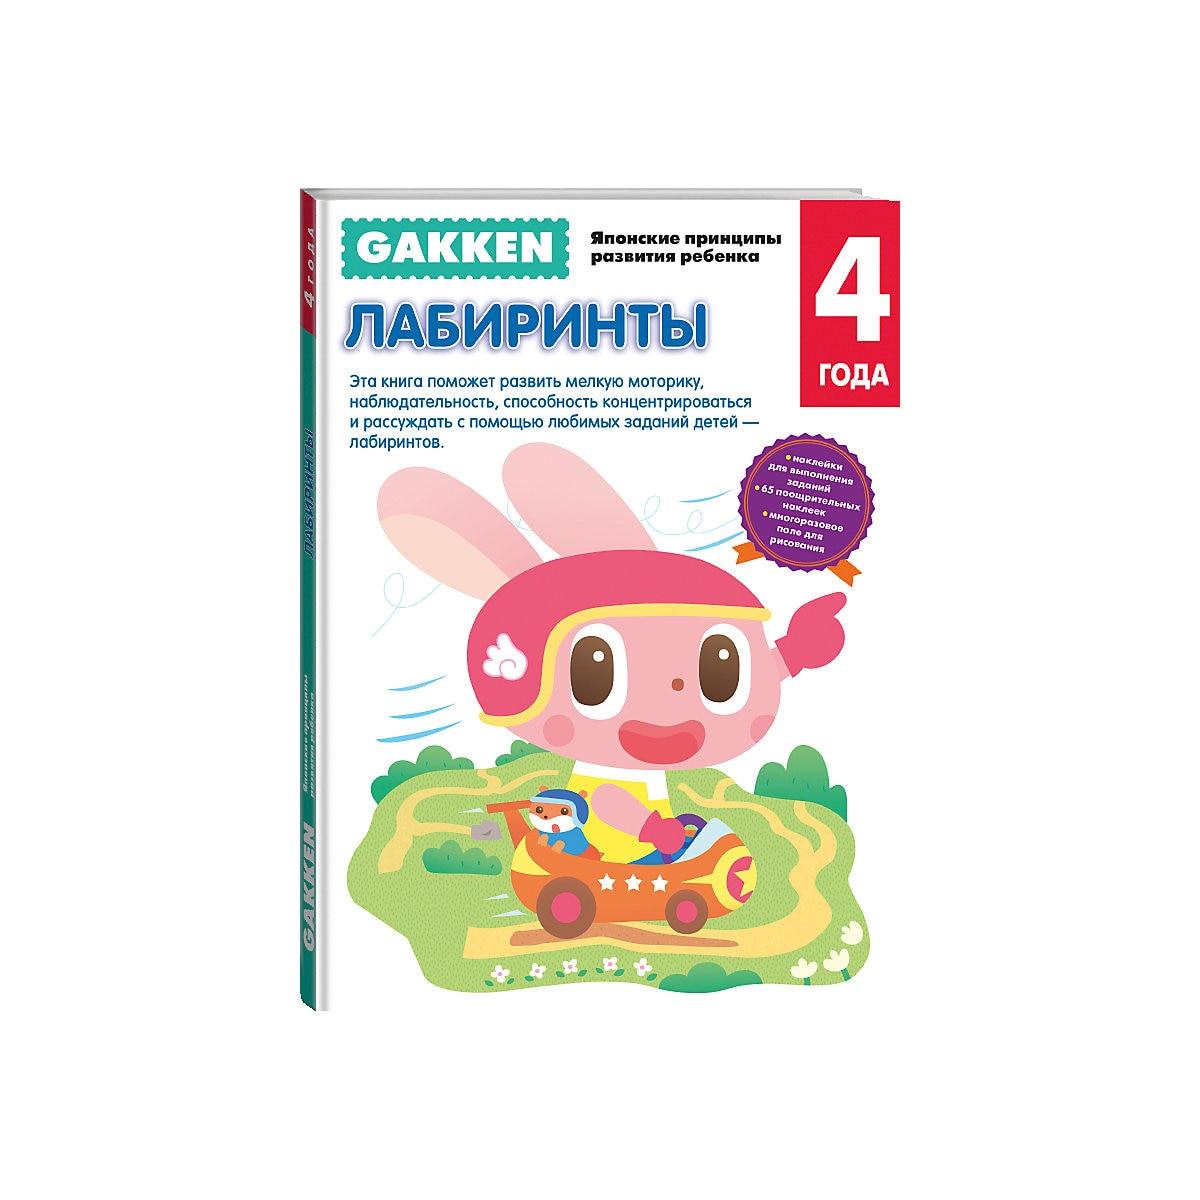 Books EKSMO 5535524 Children Education Encyclopedia Alphabet Dictionary Book For Baby MTpromo